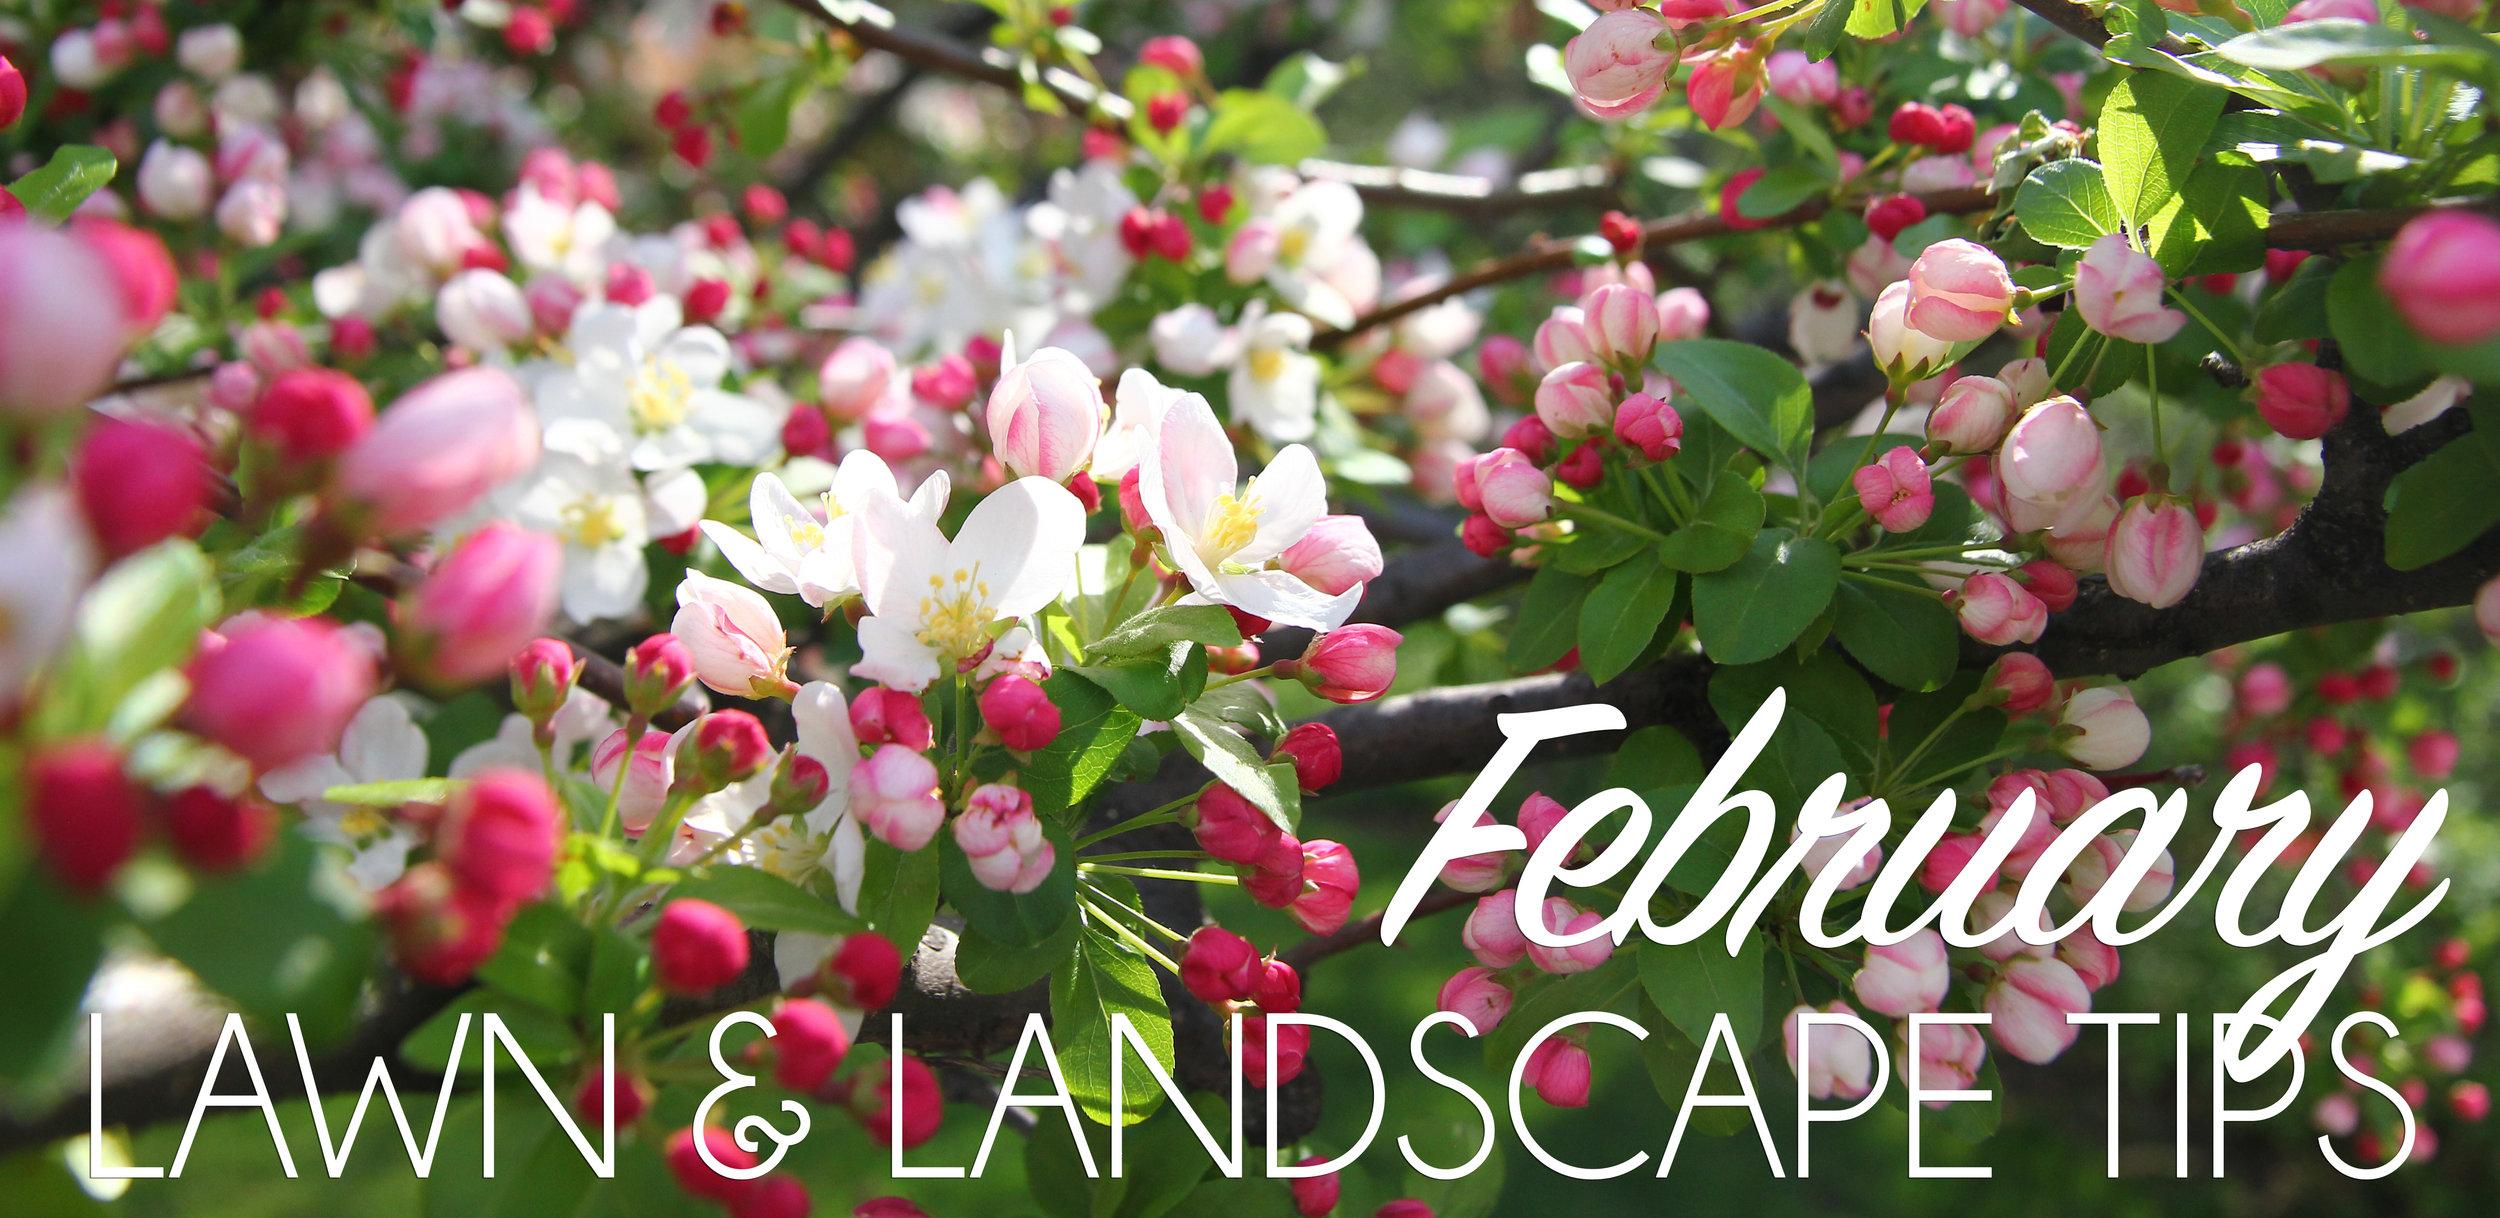 February Lawn & Landscape Header.jpg